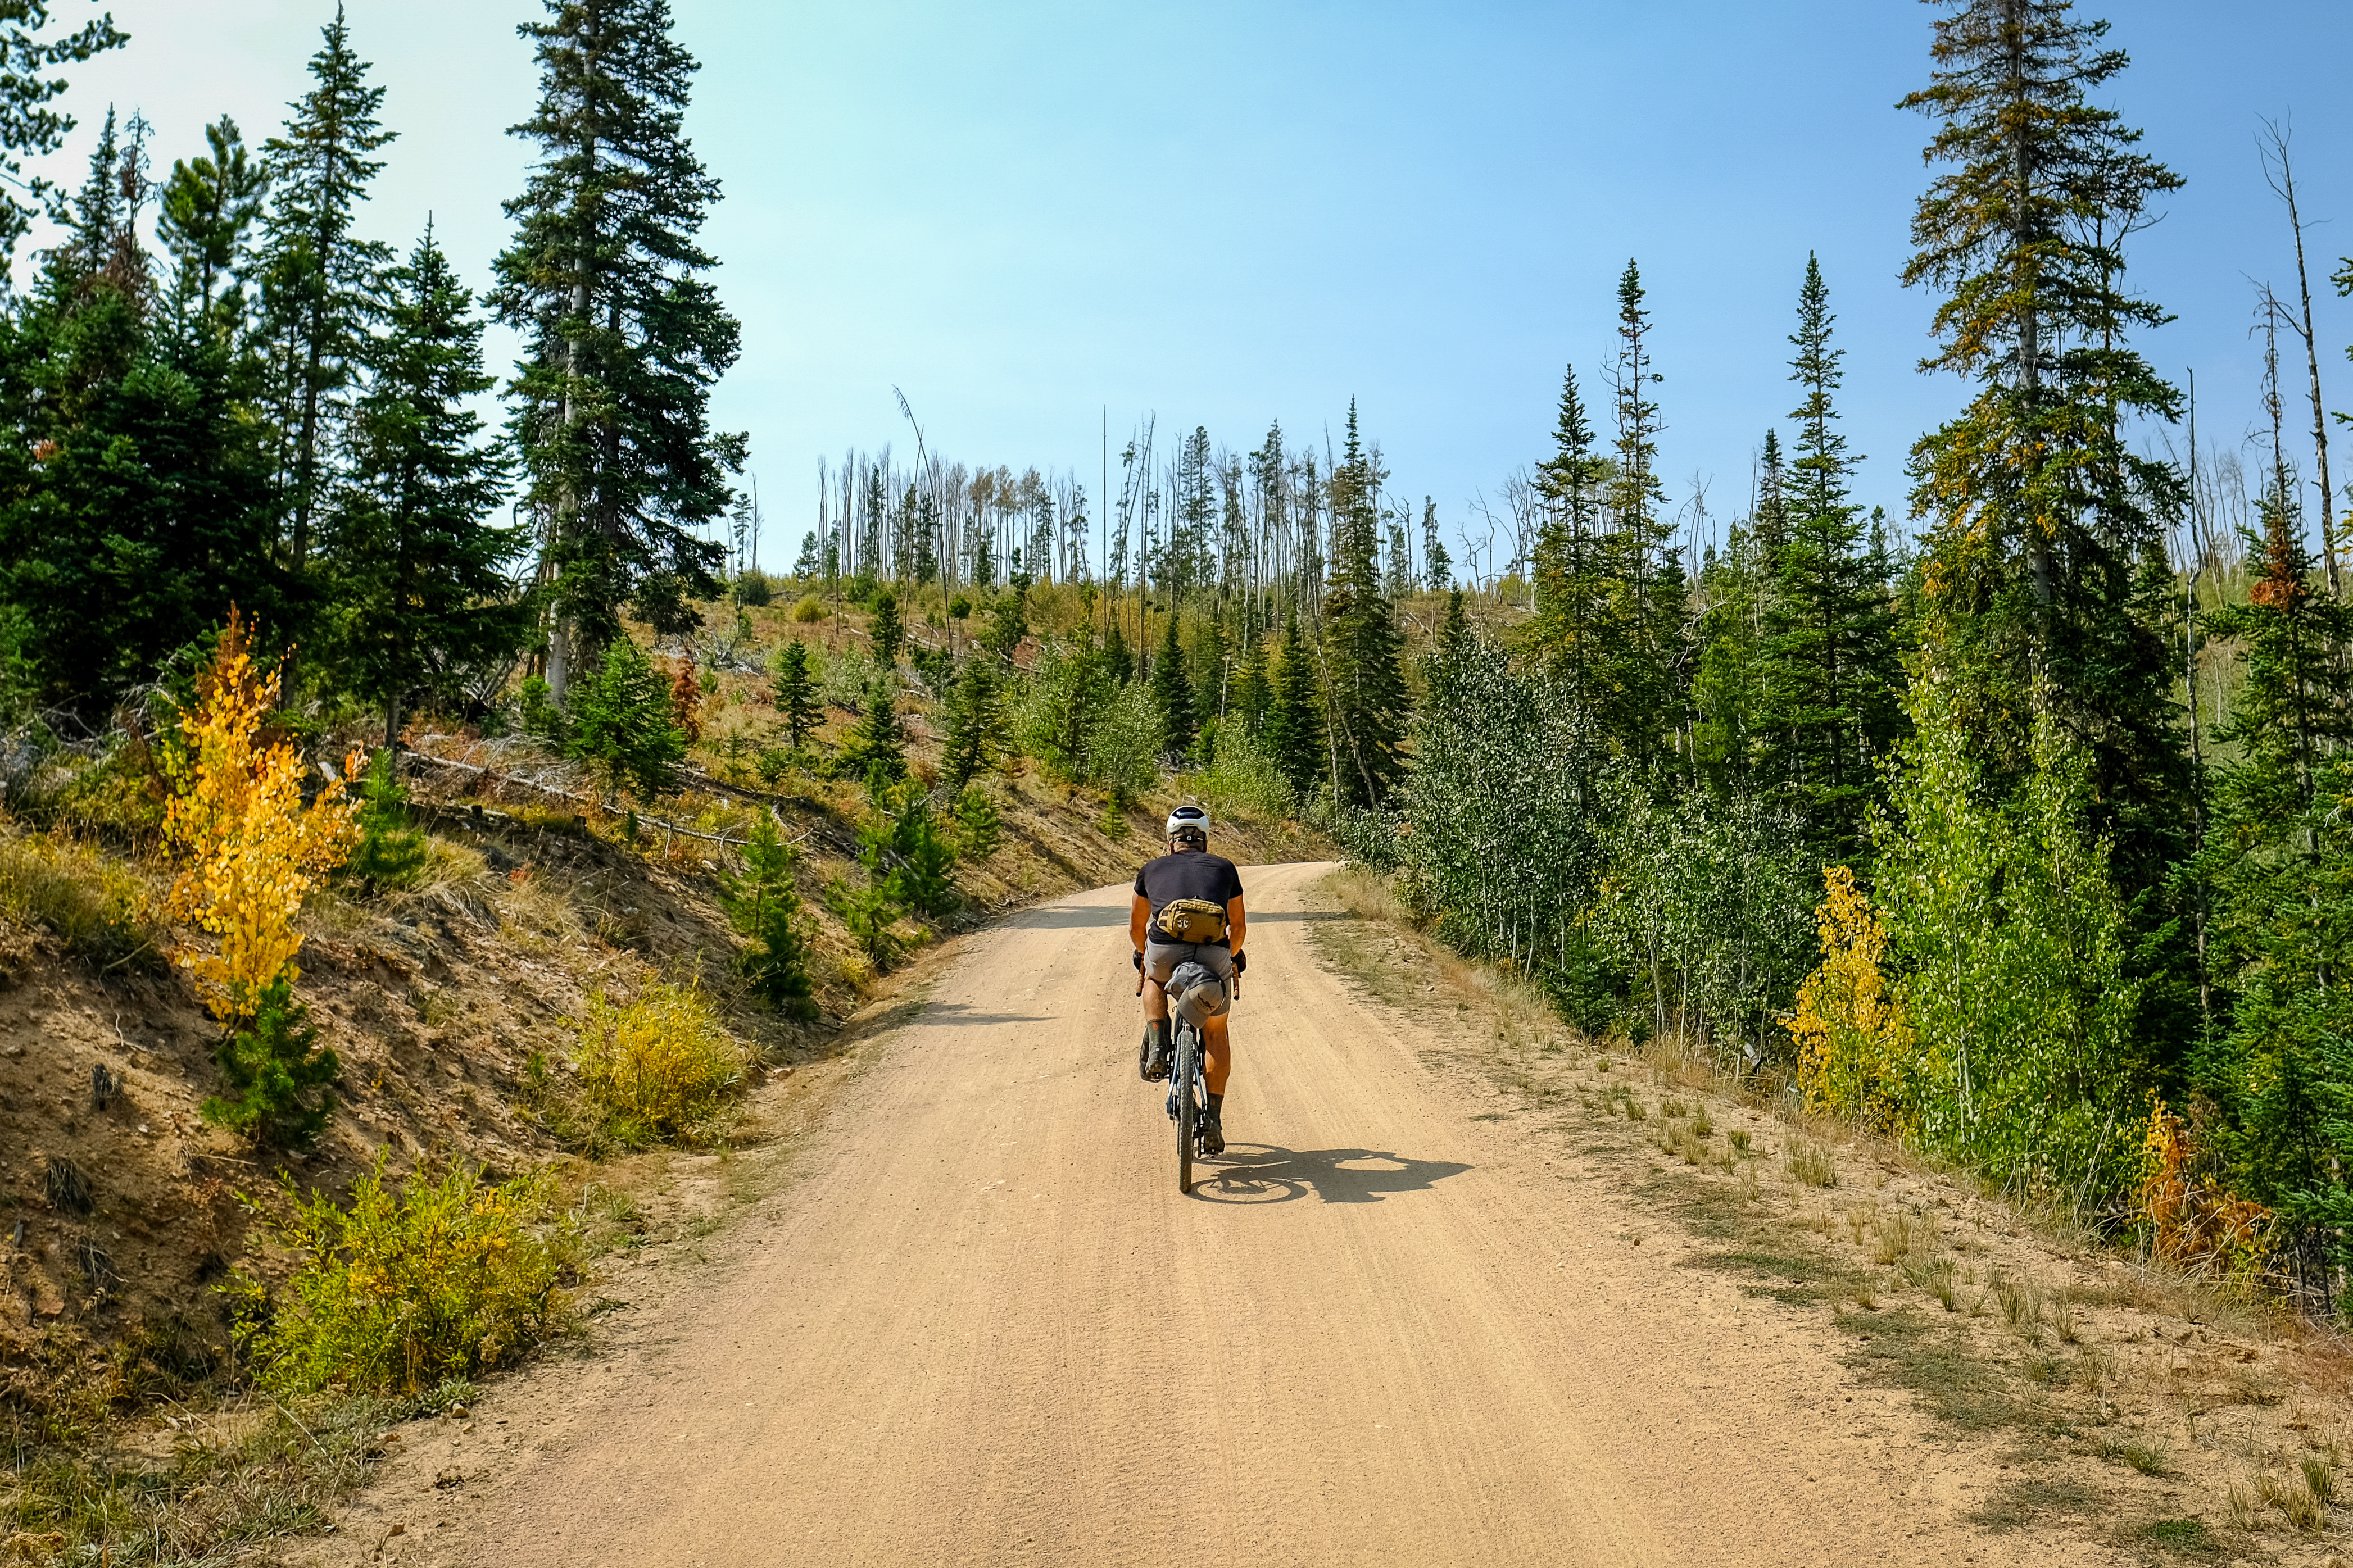 Author bikepacking down center of gravel road